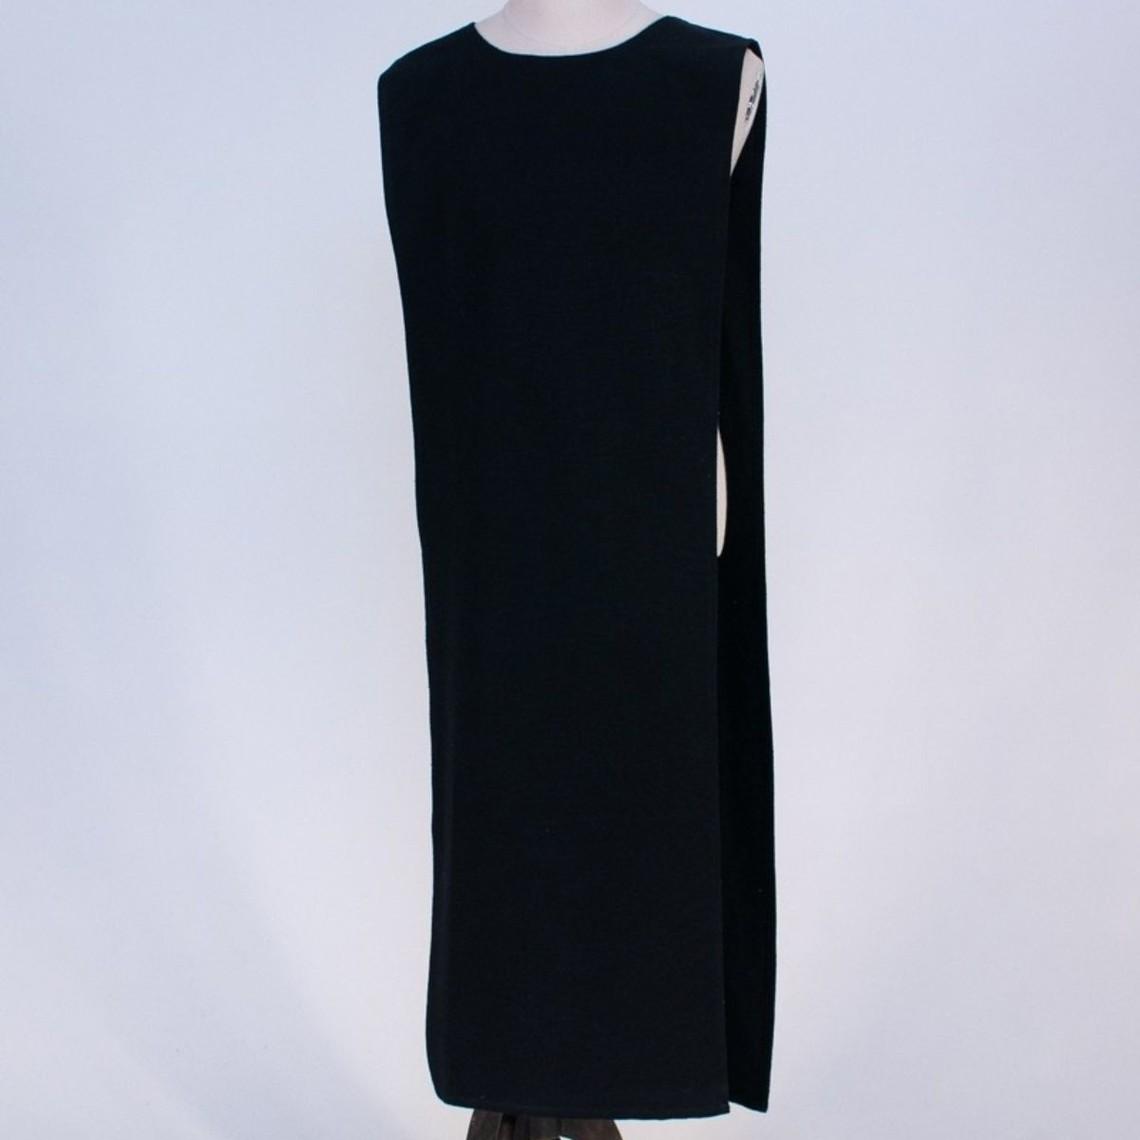 Burgschneider Medieval tabard / surcoat, noir